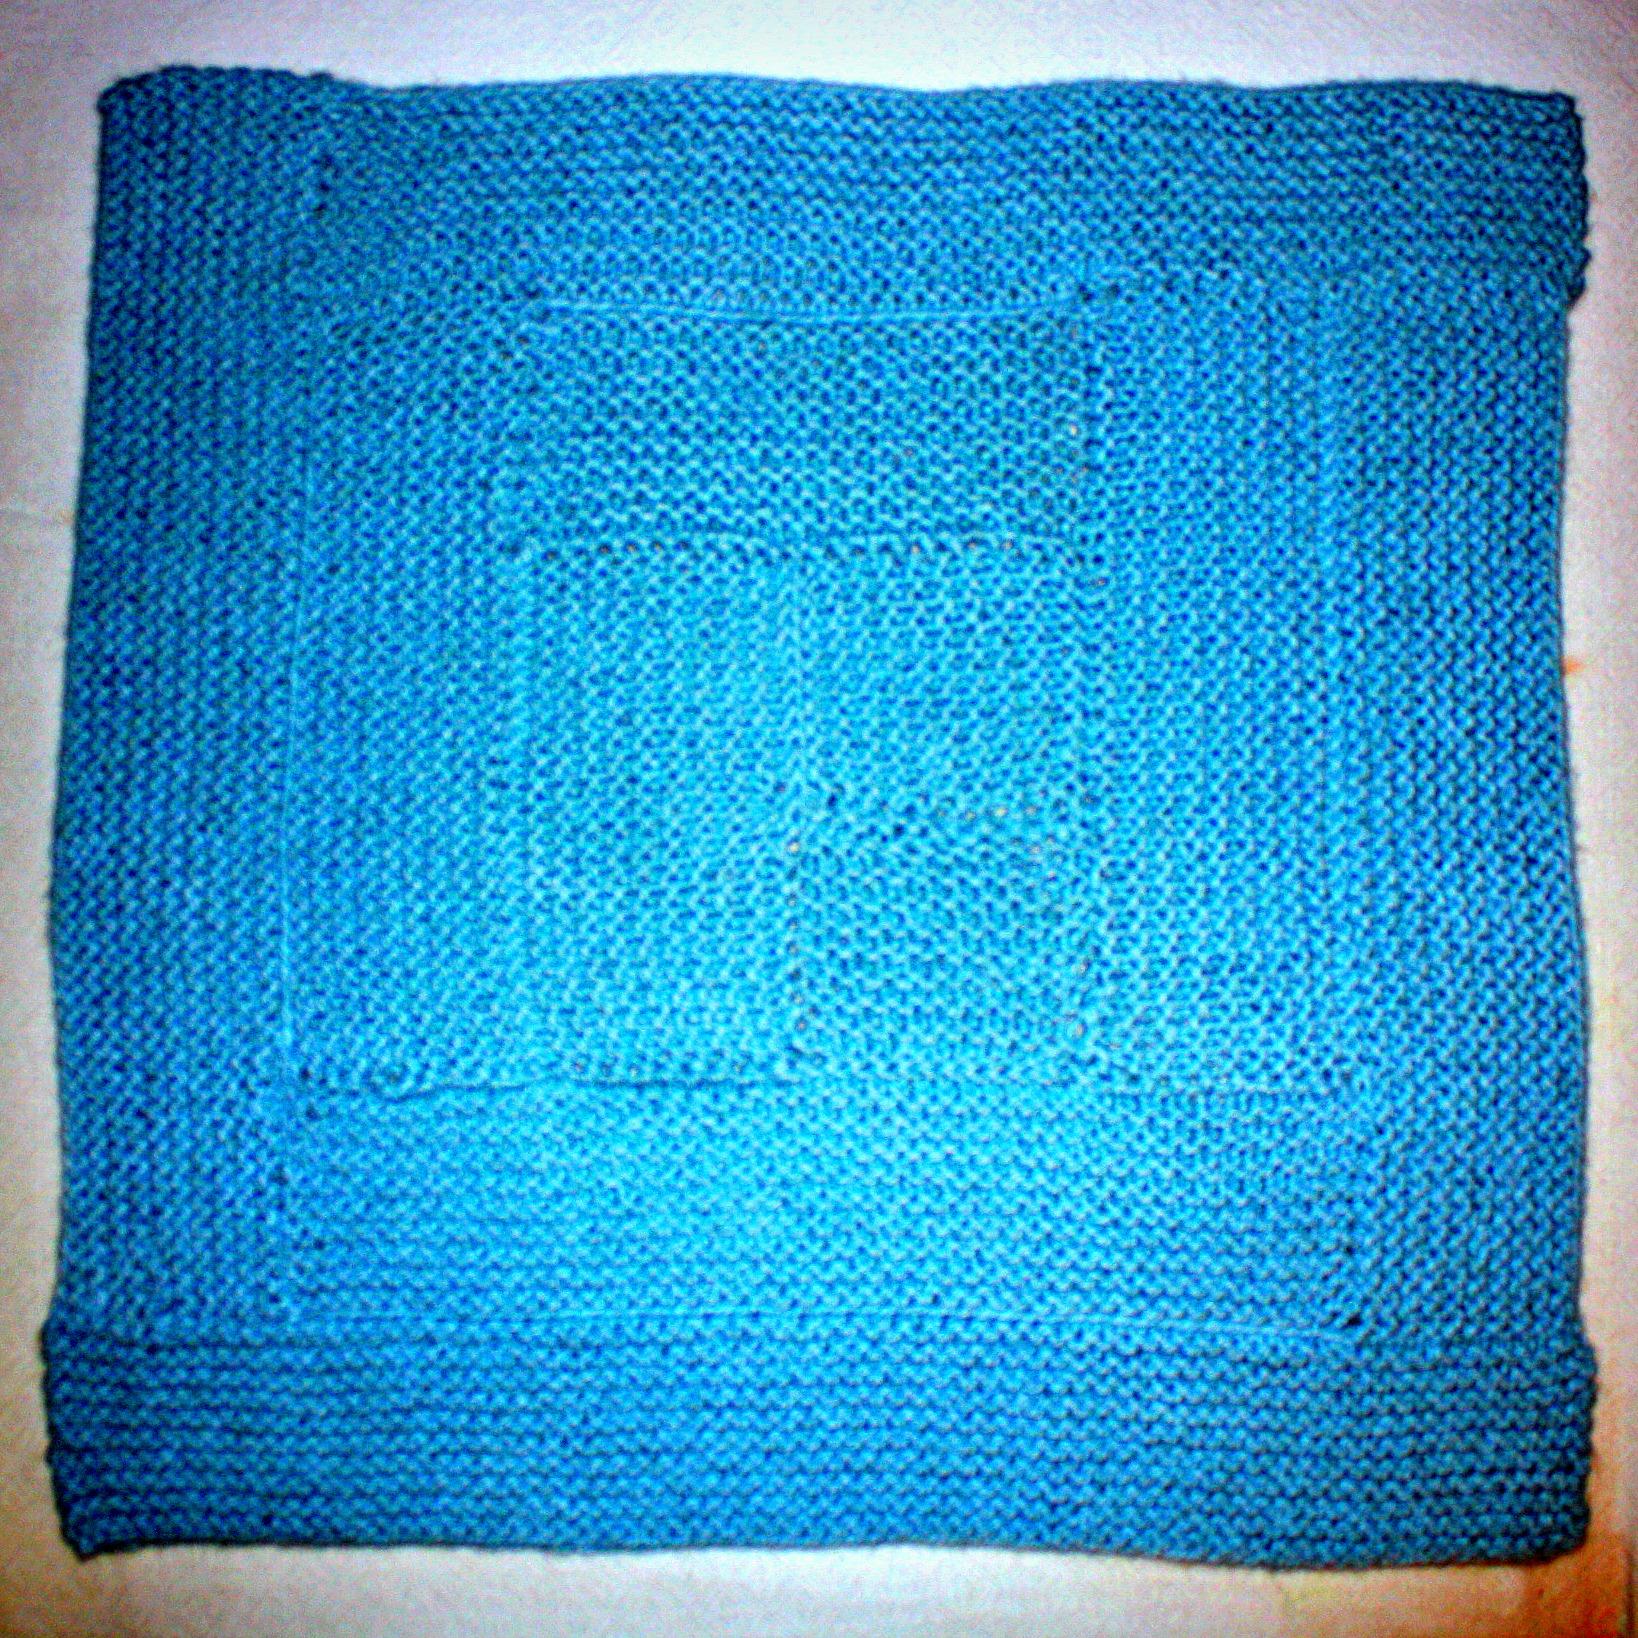 Free knitting pattern for garter stitch baby blanket